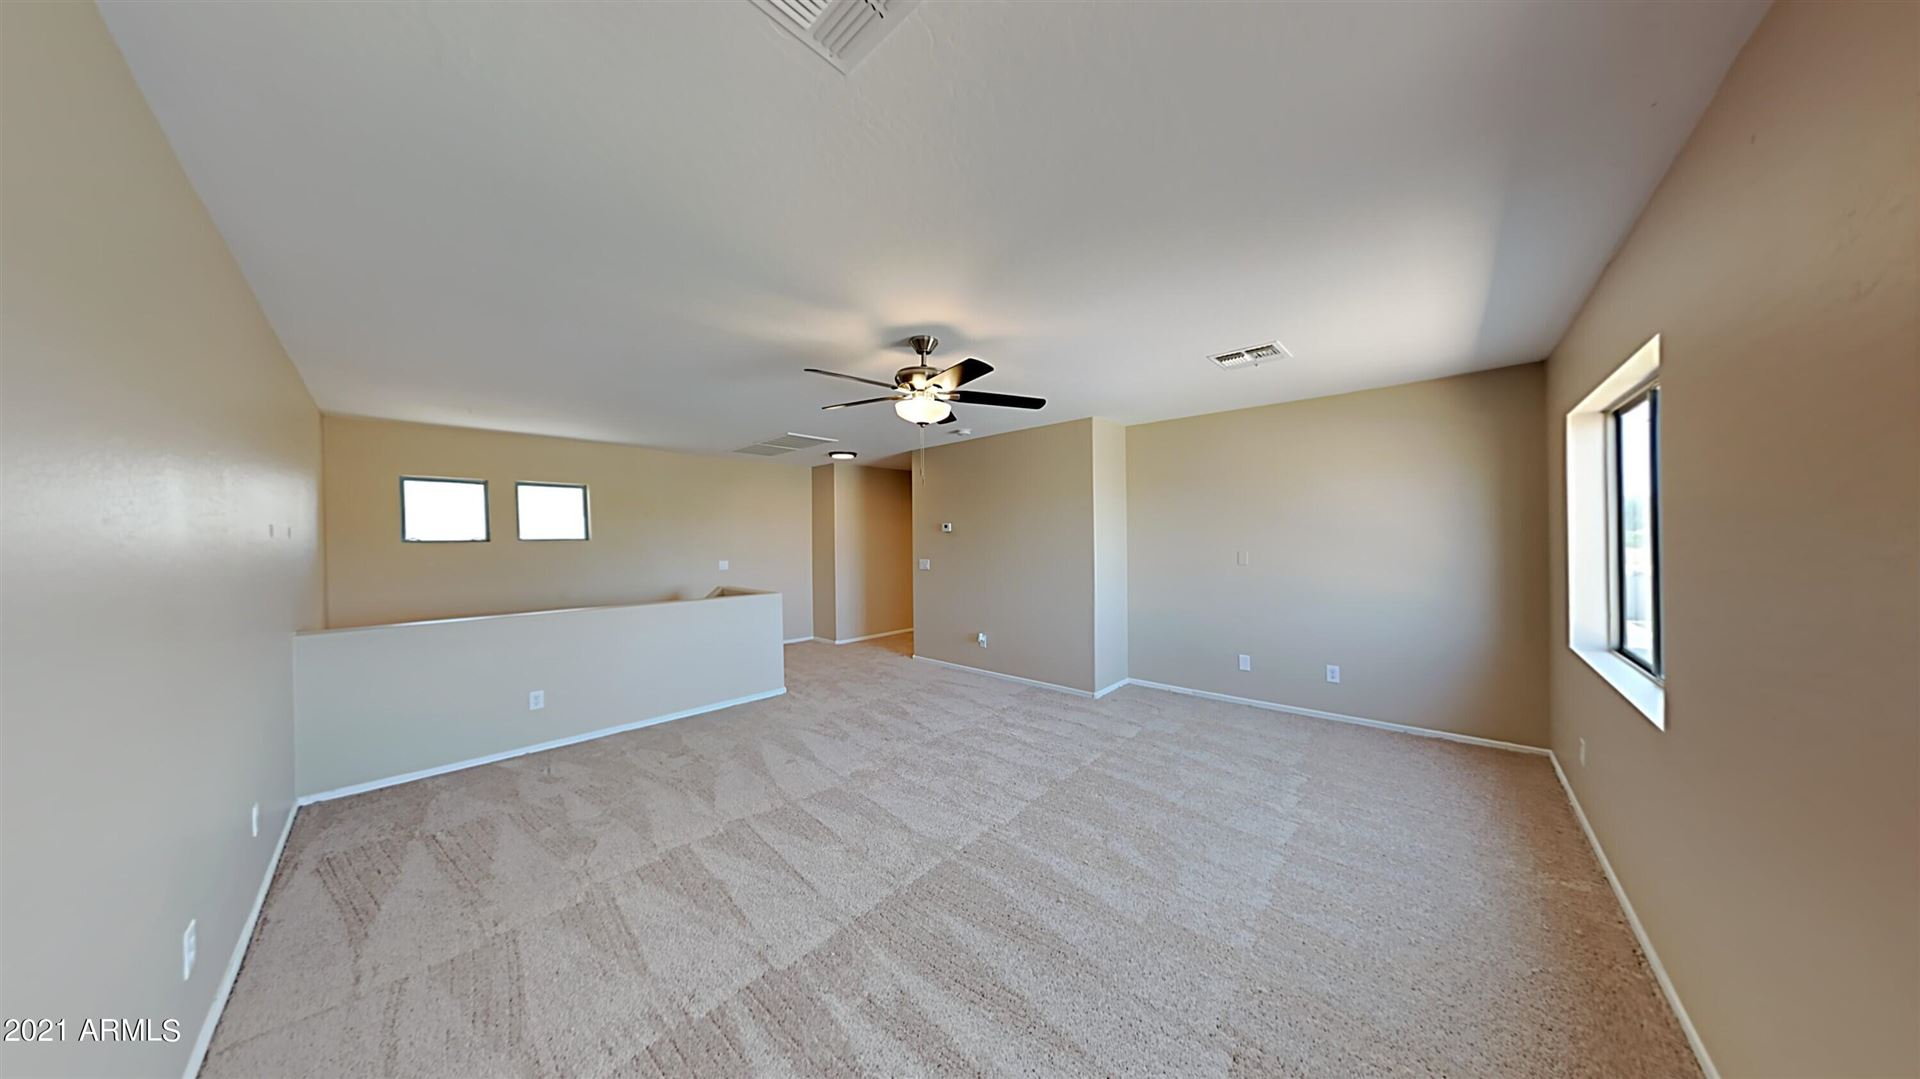 Photo of 12410 N 124TH Lane, El Mirage, AZ 85335 (MLS # 6293759)